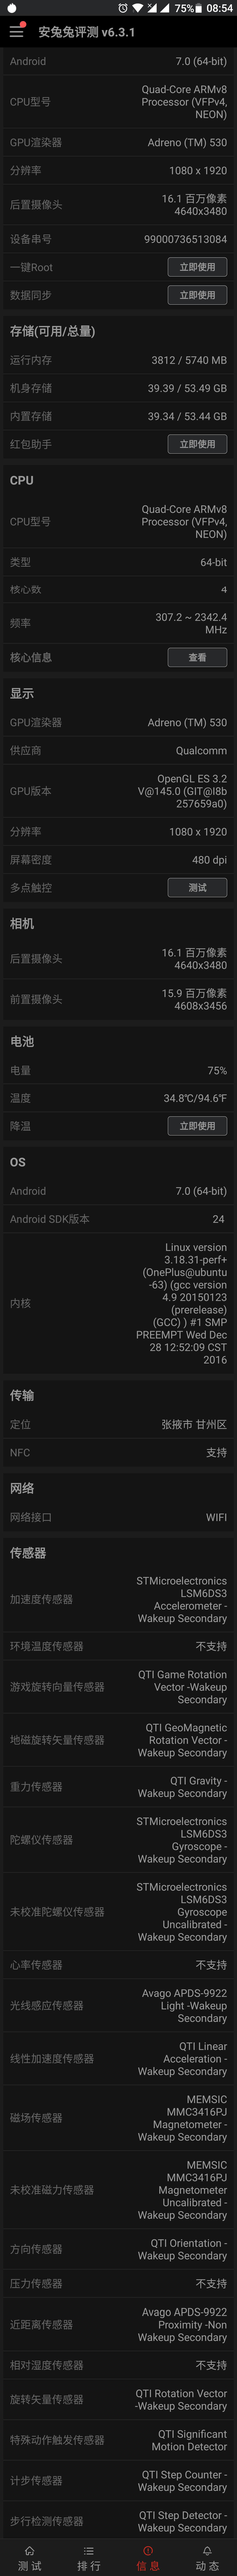 Screenshot_2017-01-05-08-54-49-15.png